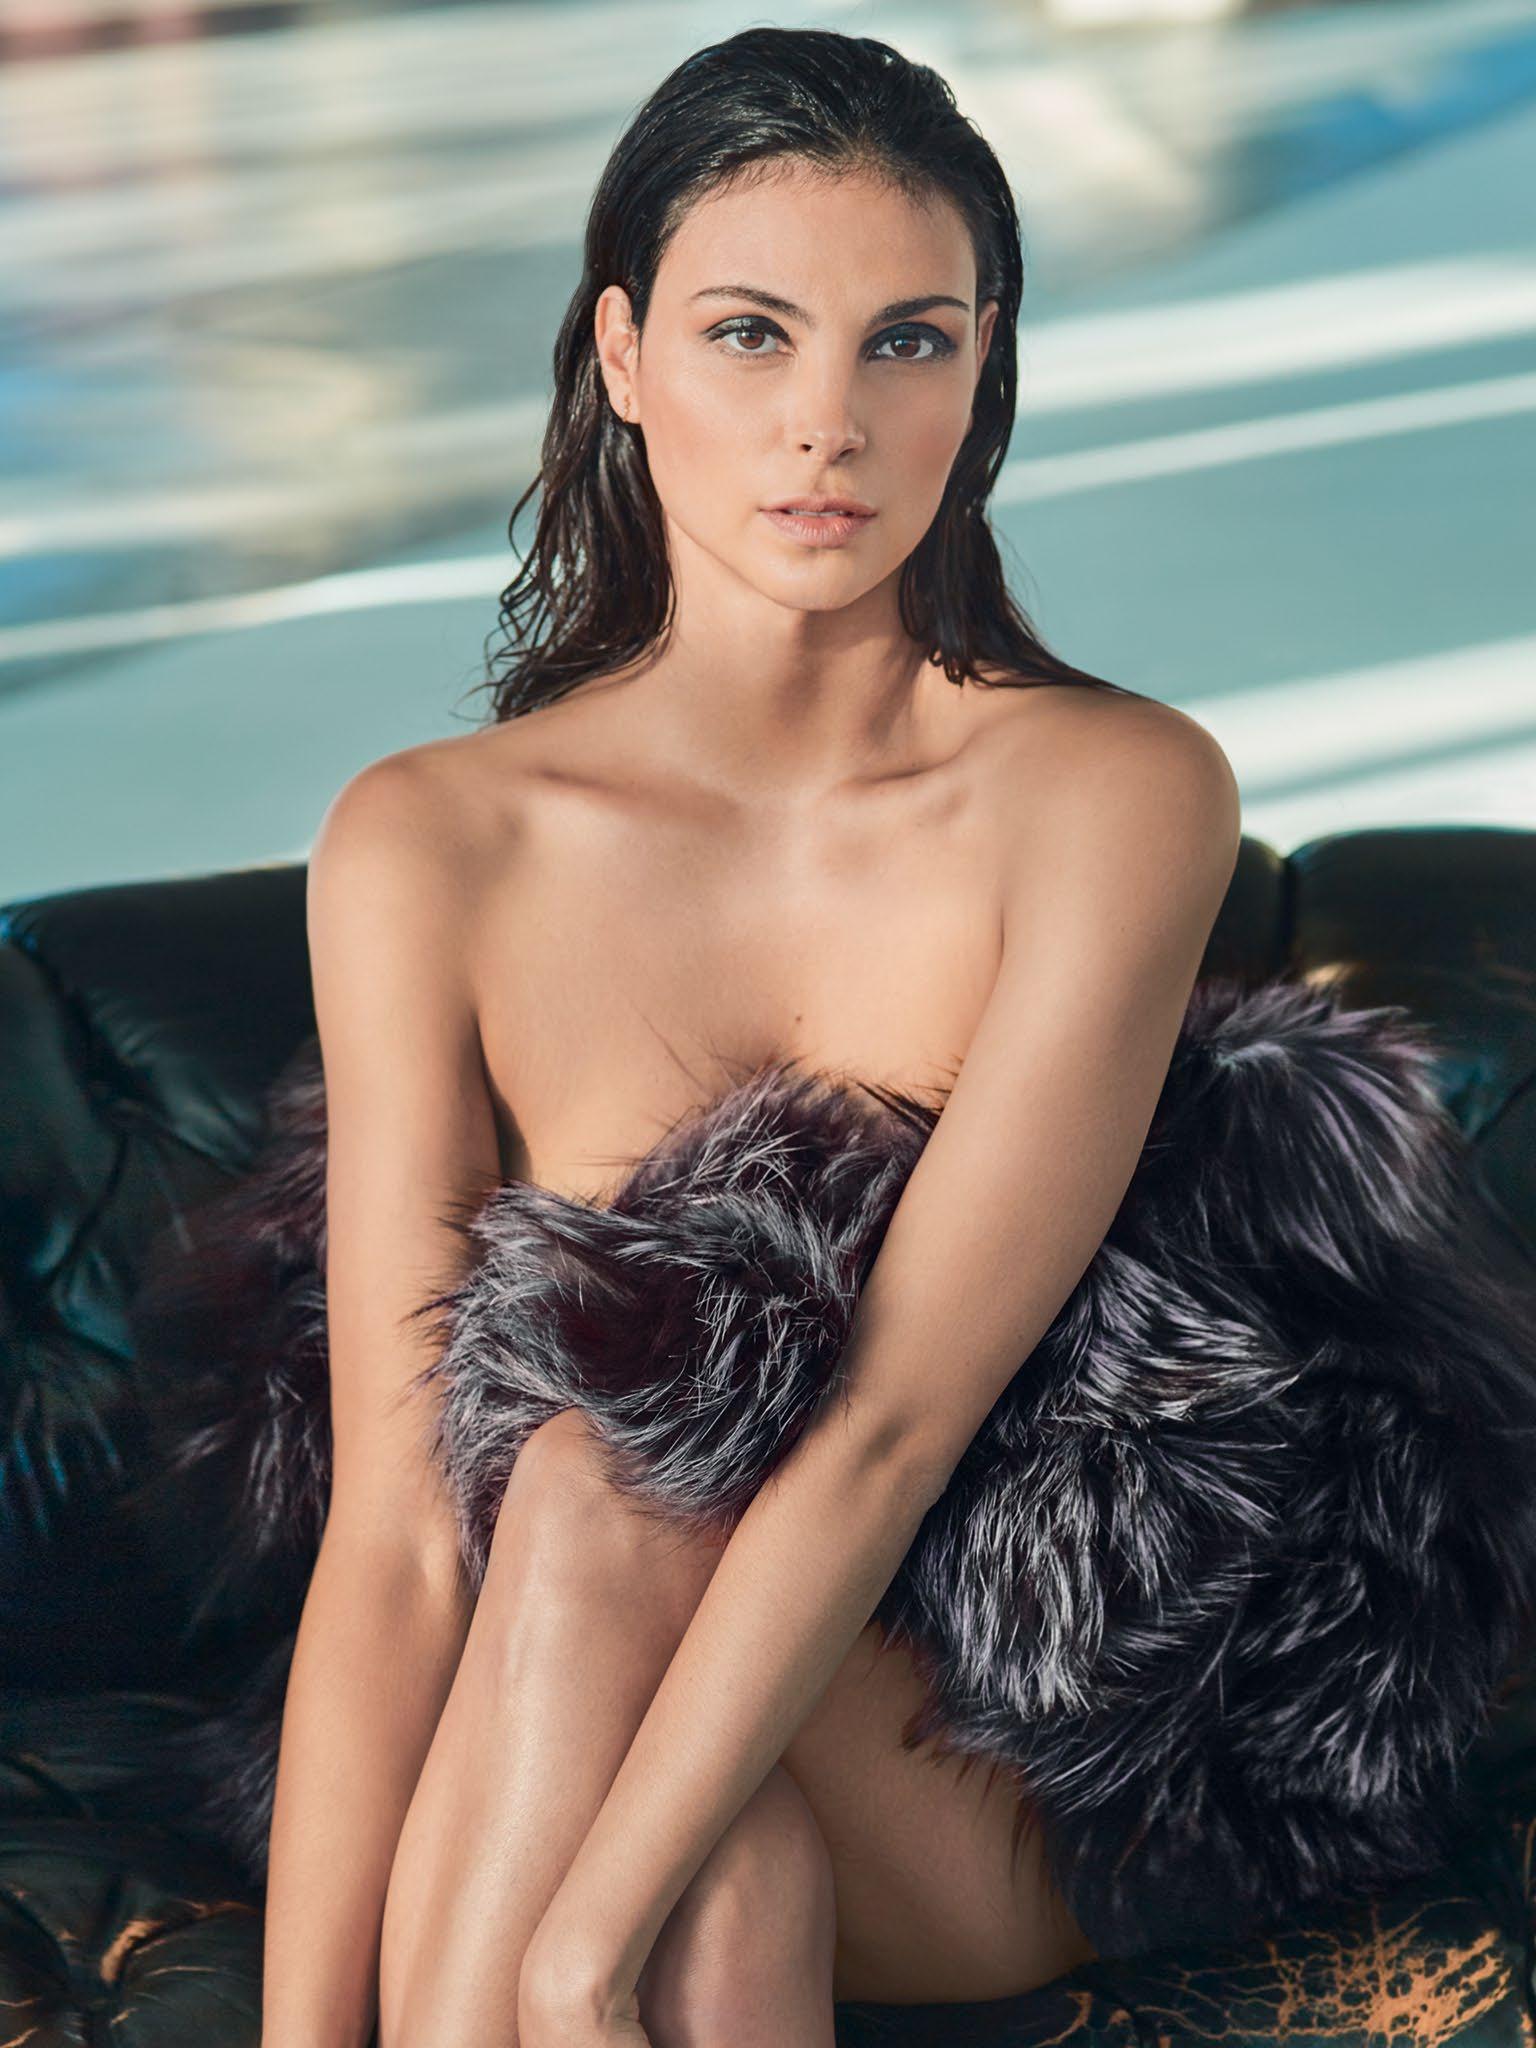 Morena Baccarin boobs show